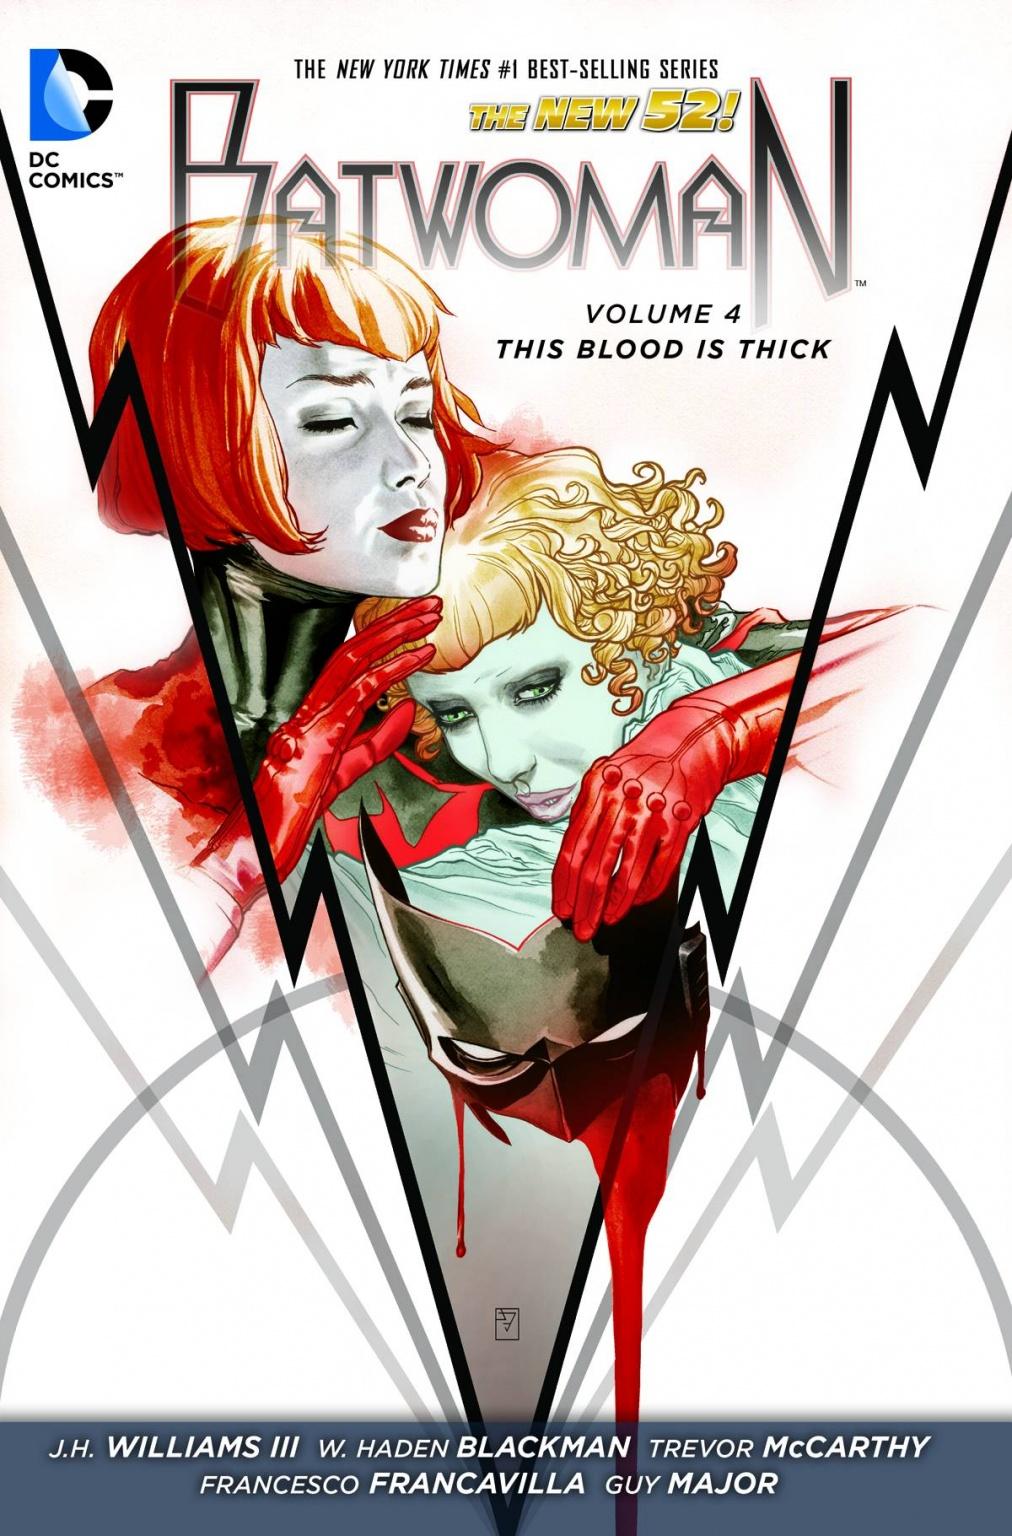 <eM>Batwoman Vol. 4: This Blood is Thick</eM>